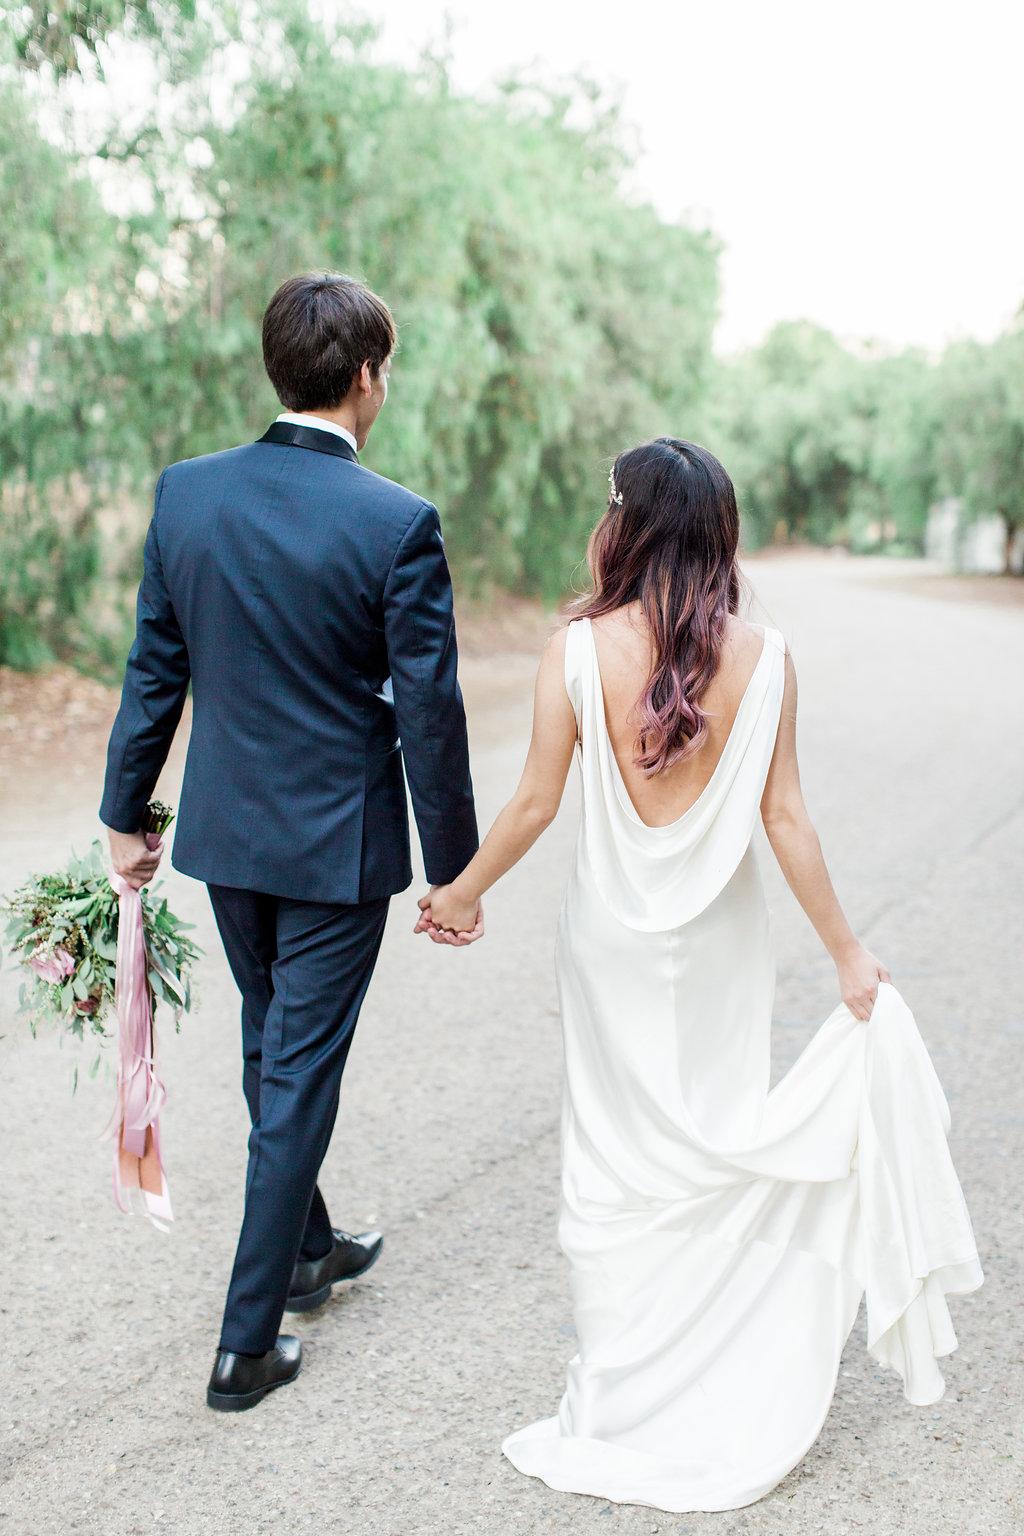 Eden Gardens Wedding Photographer- Moorpark, Ca